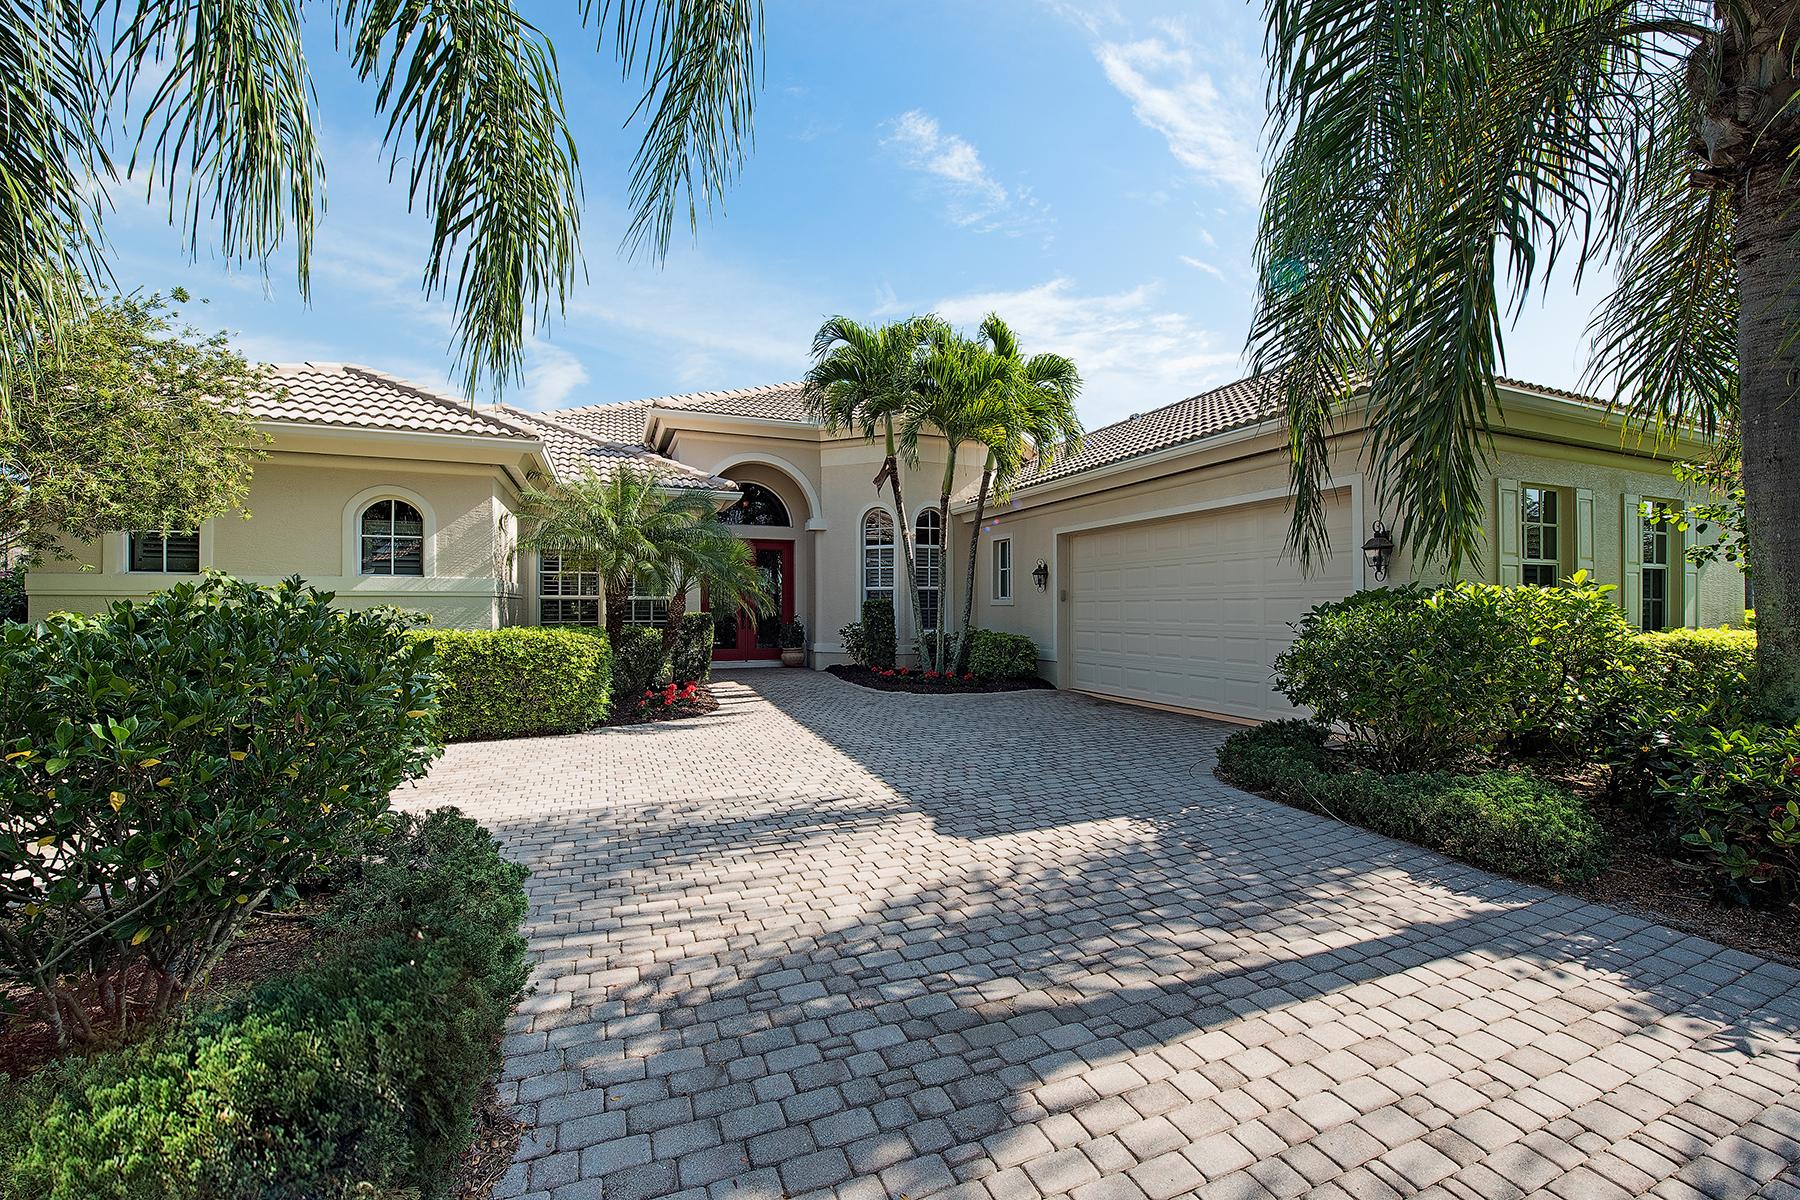 House for Sale at CEDAR GLEN 9110 Hollow Pine Dr Estero, Florida 34135 United States